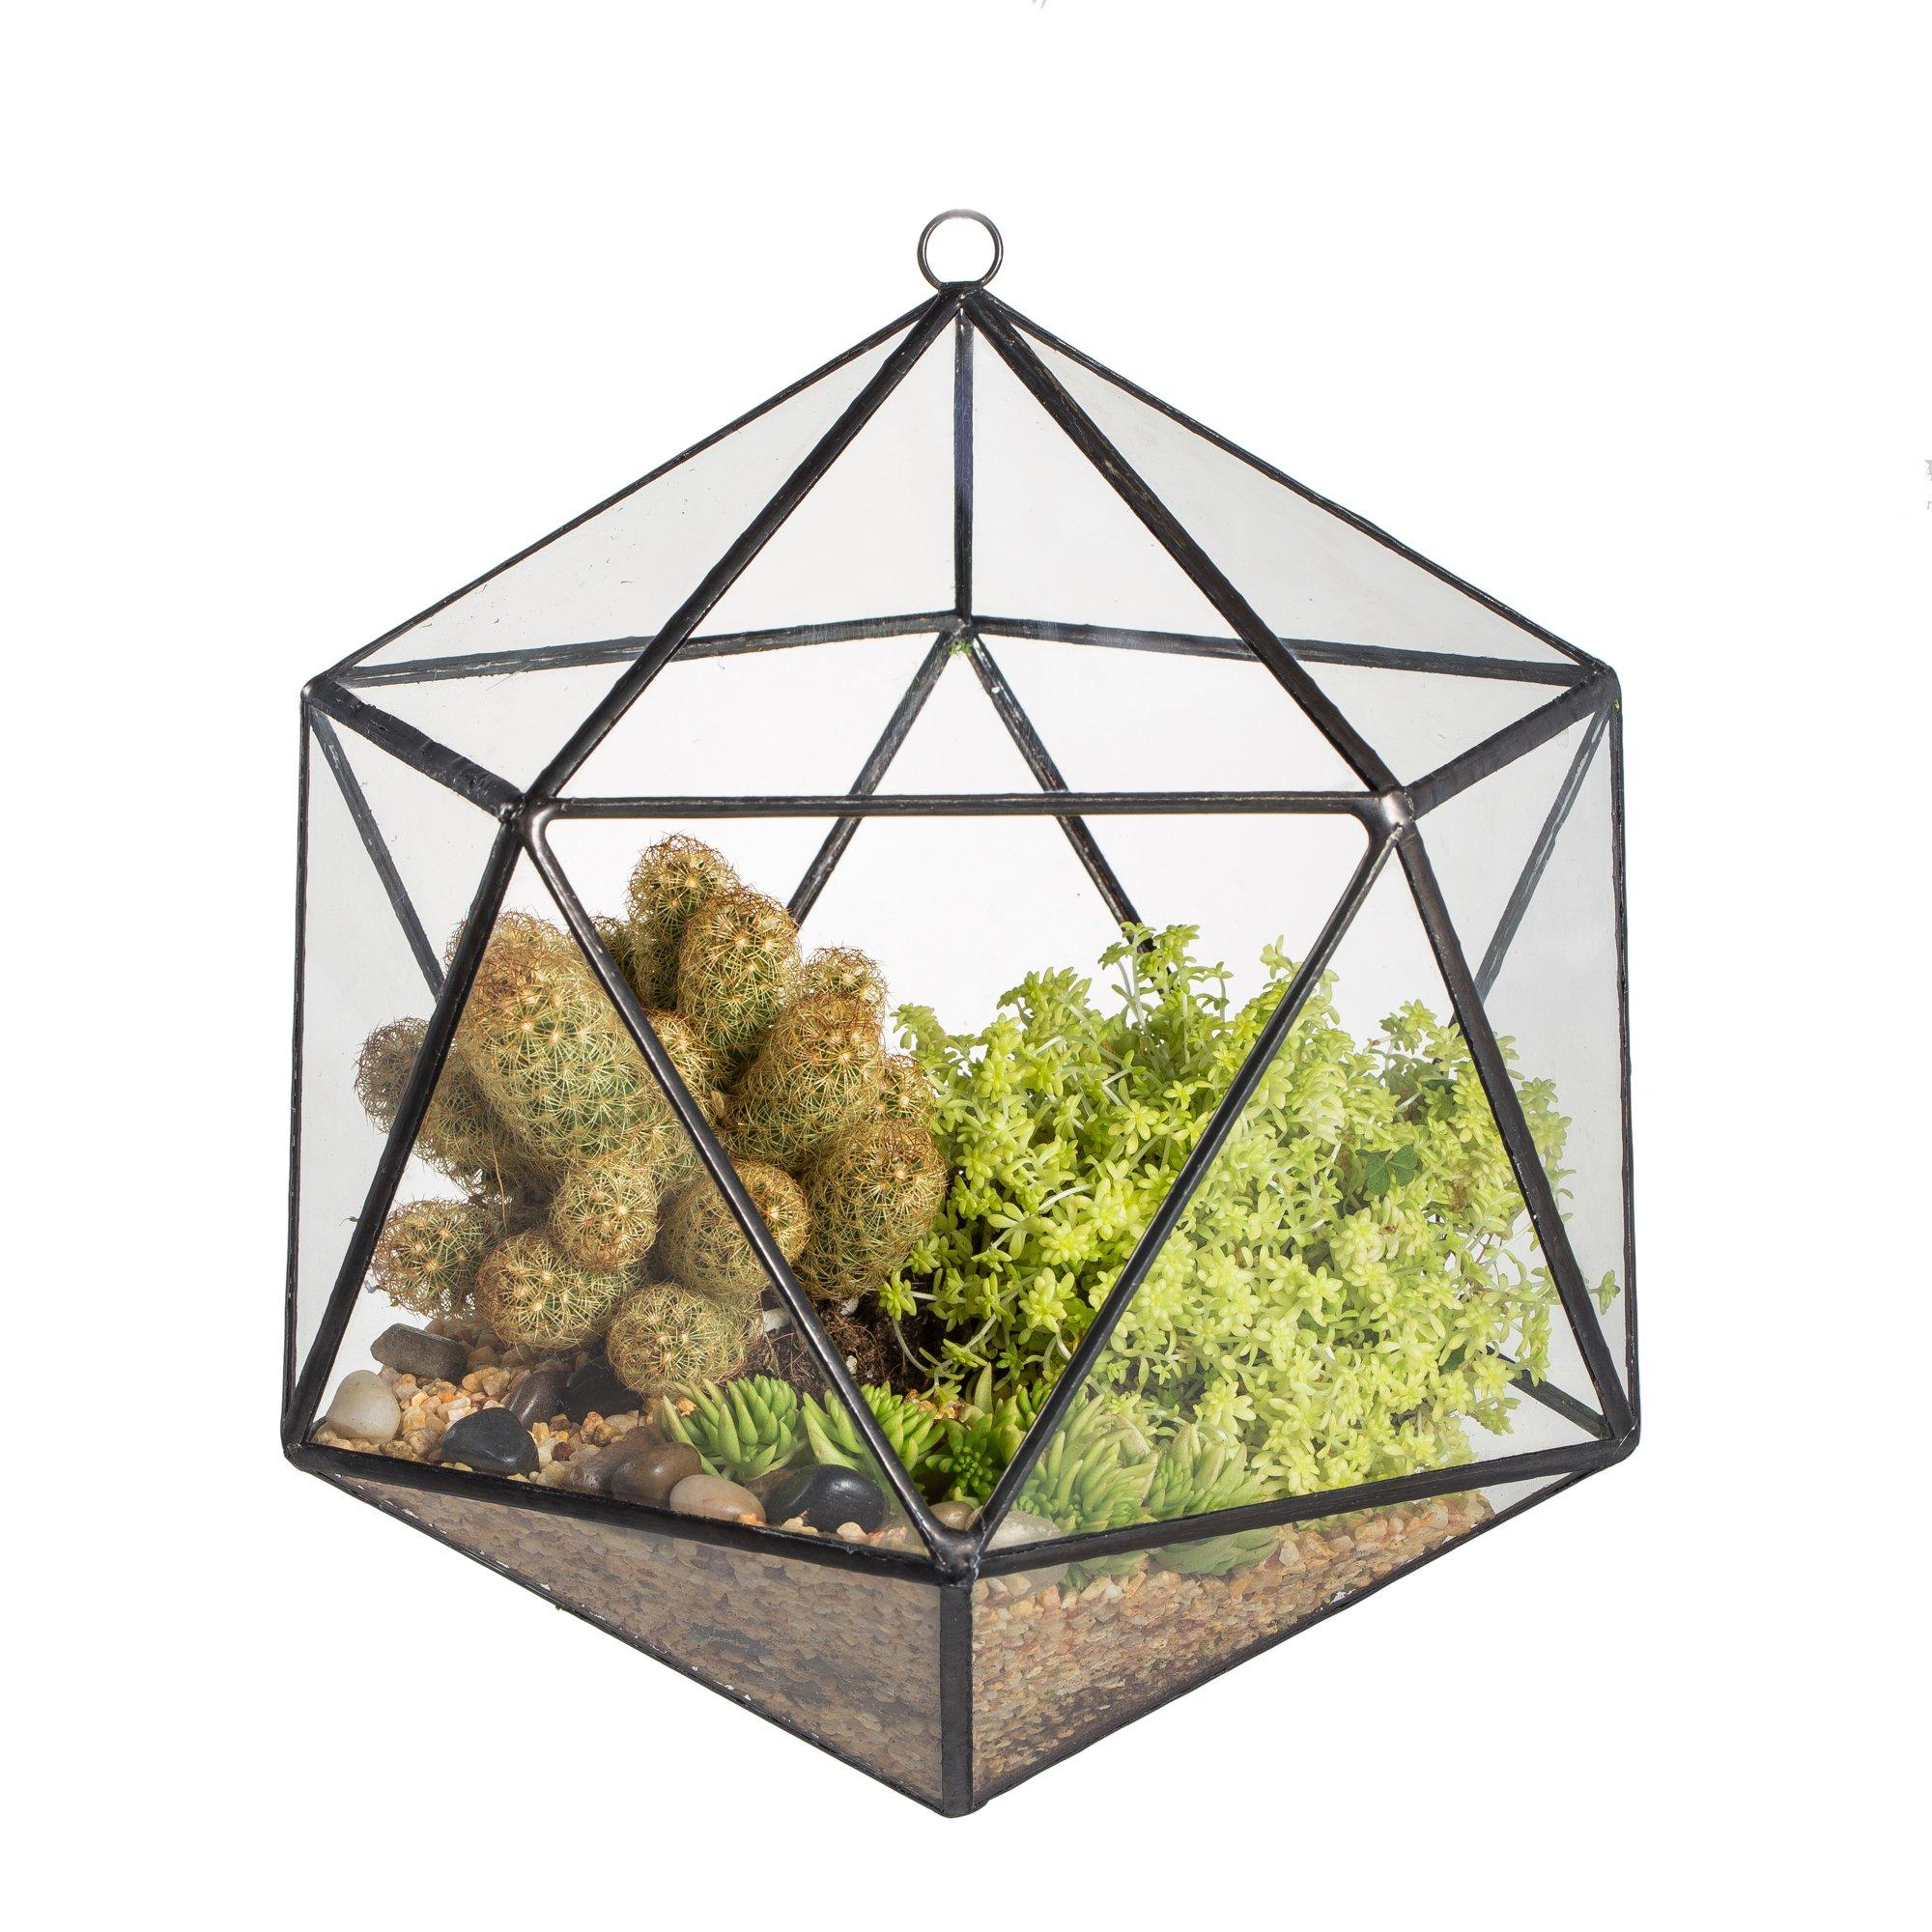 NCYP Wall Hanging Geometric Terrarium Balcony Tabletop Windowsill Decor Glass Flower Pot Modern Large Indoor Garden Micro Landscape Icosahedron Planter for Succulent Plant (NO Plants)